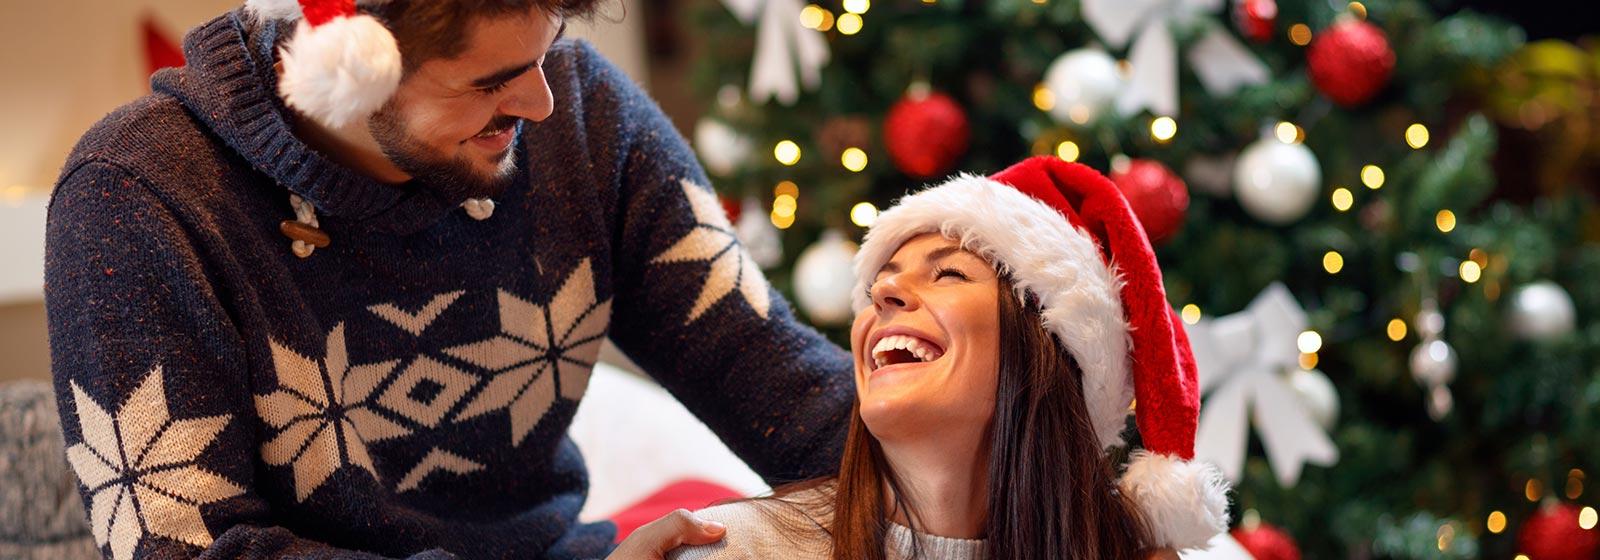 Breadsall Priory Christmas Parties Marriott Uk Celebrations